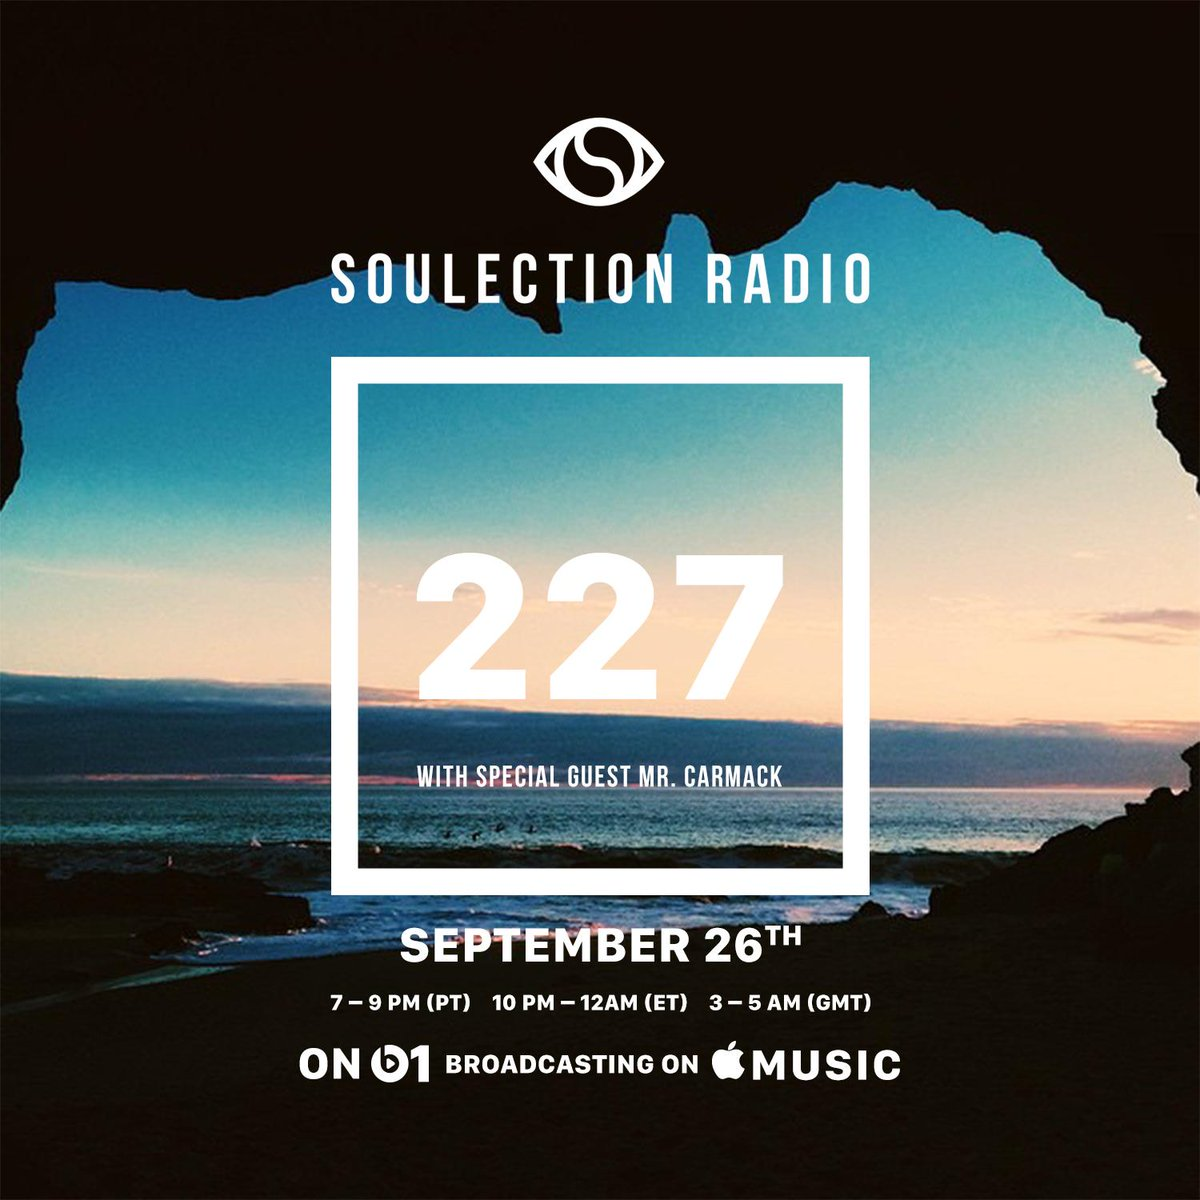 30 mins 'till @mrcarmack destroys radio. @Soulection #227 with @J0EKAY is next on @Beats1. https://t.co/5BCVGCNxRK http://t.co/XZHYtpfKui